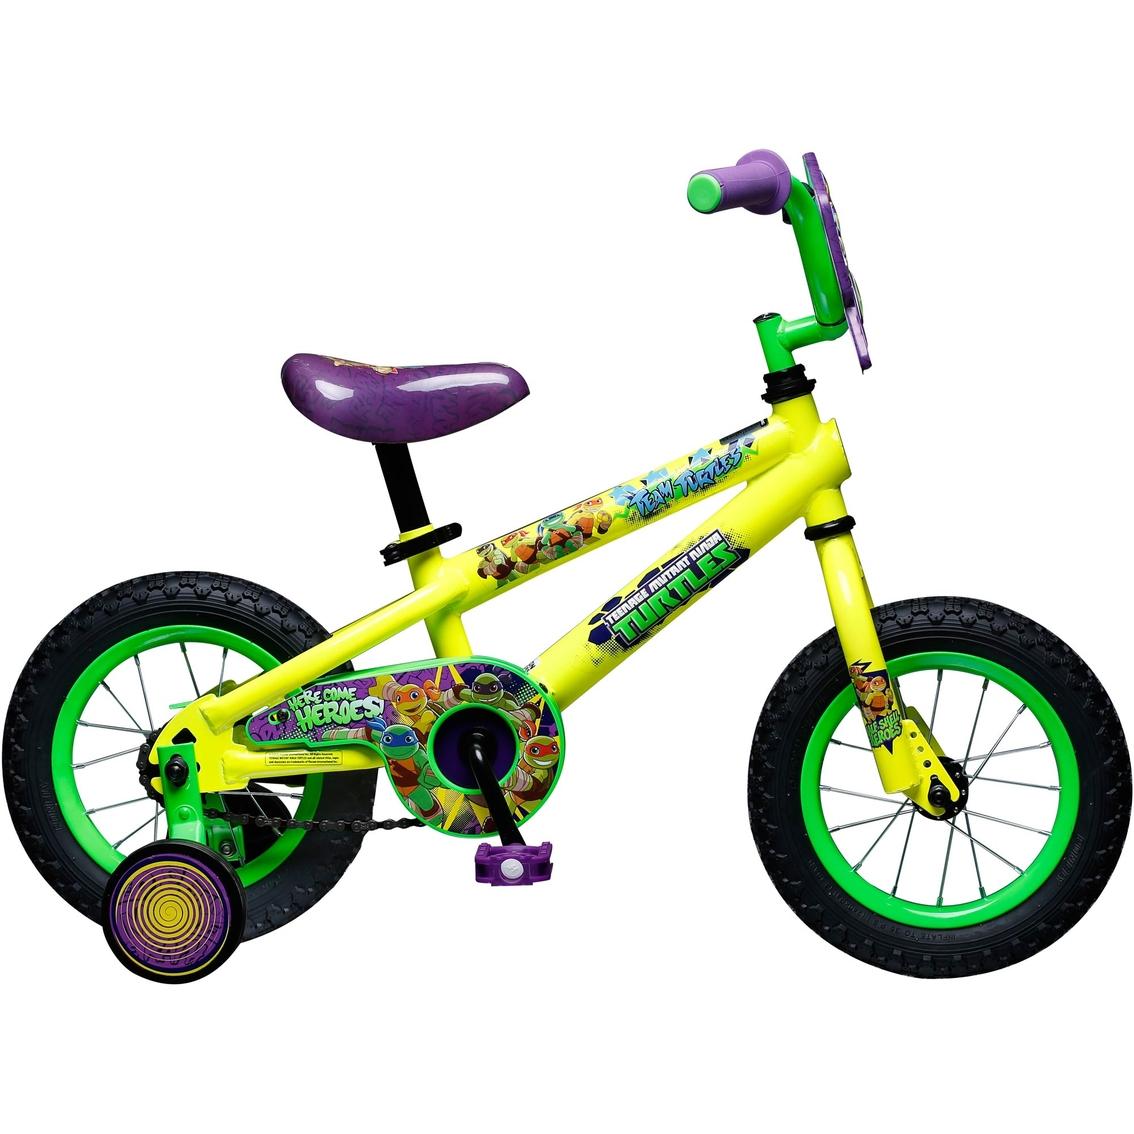 989752e171abd Pacific Cycle Boys Teenage Mutant Ninja Turtles Half Shell Heroes 12 in.  Bike